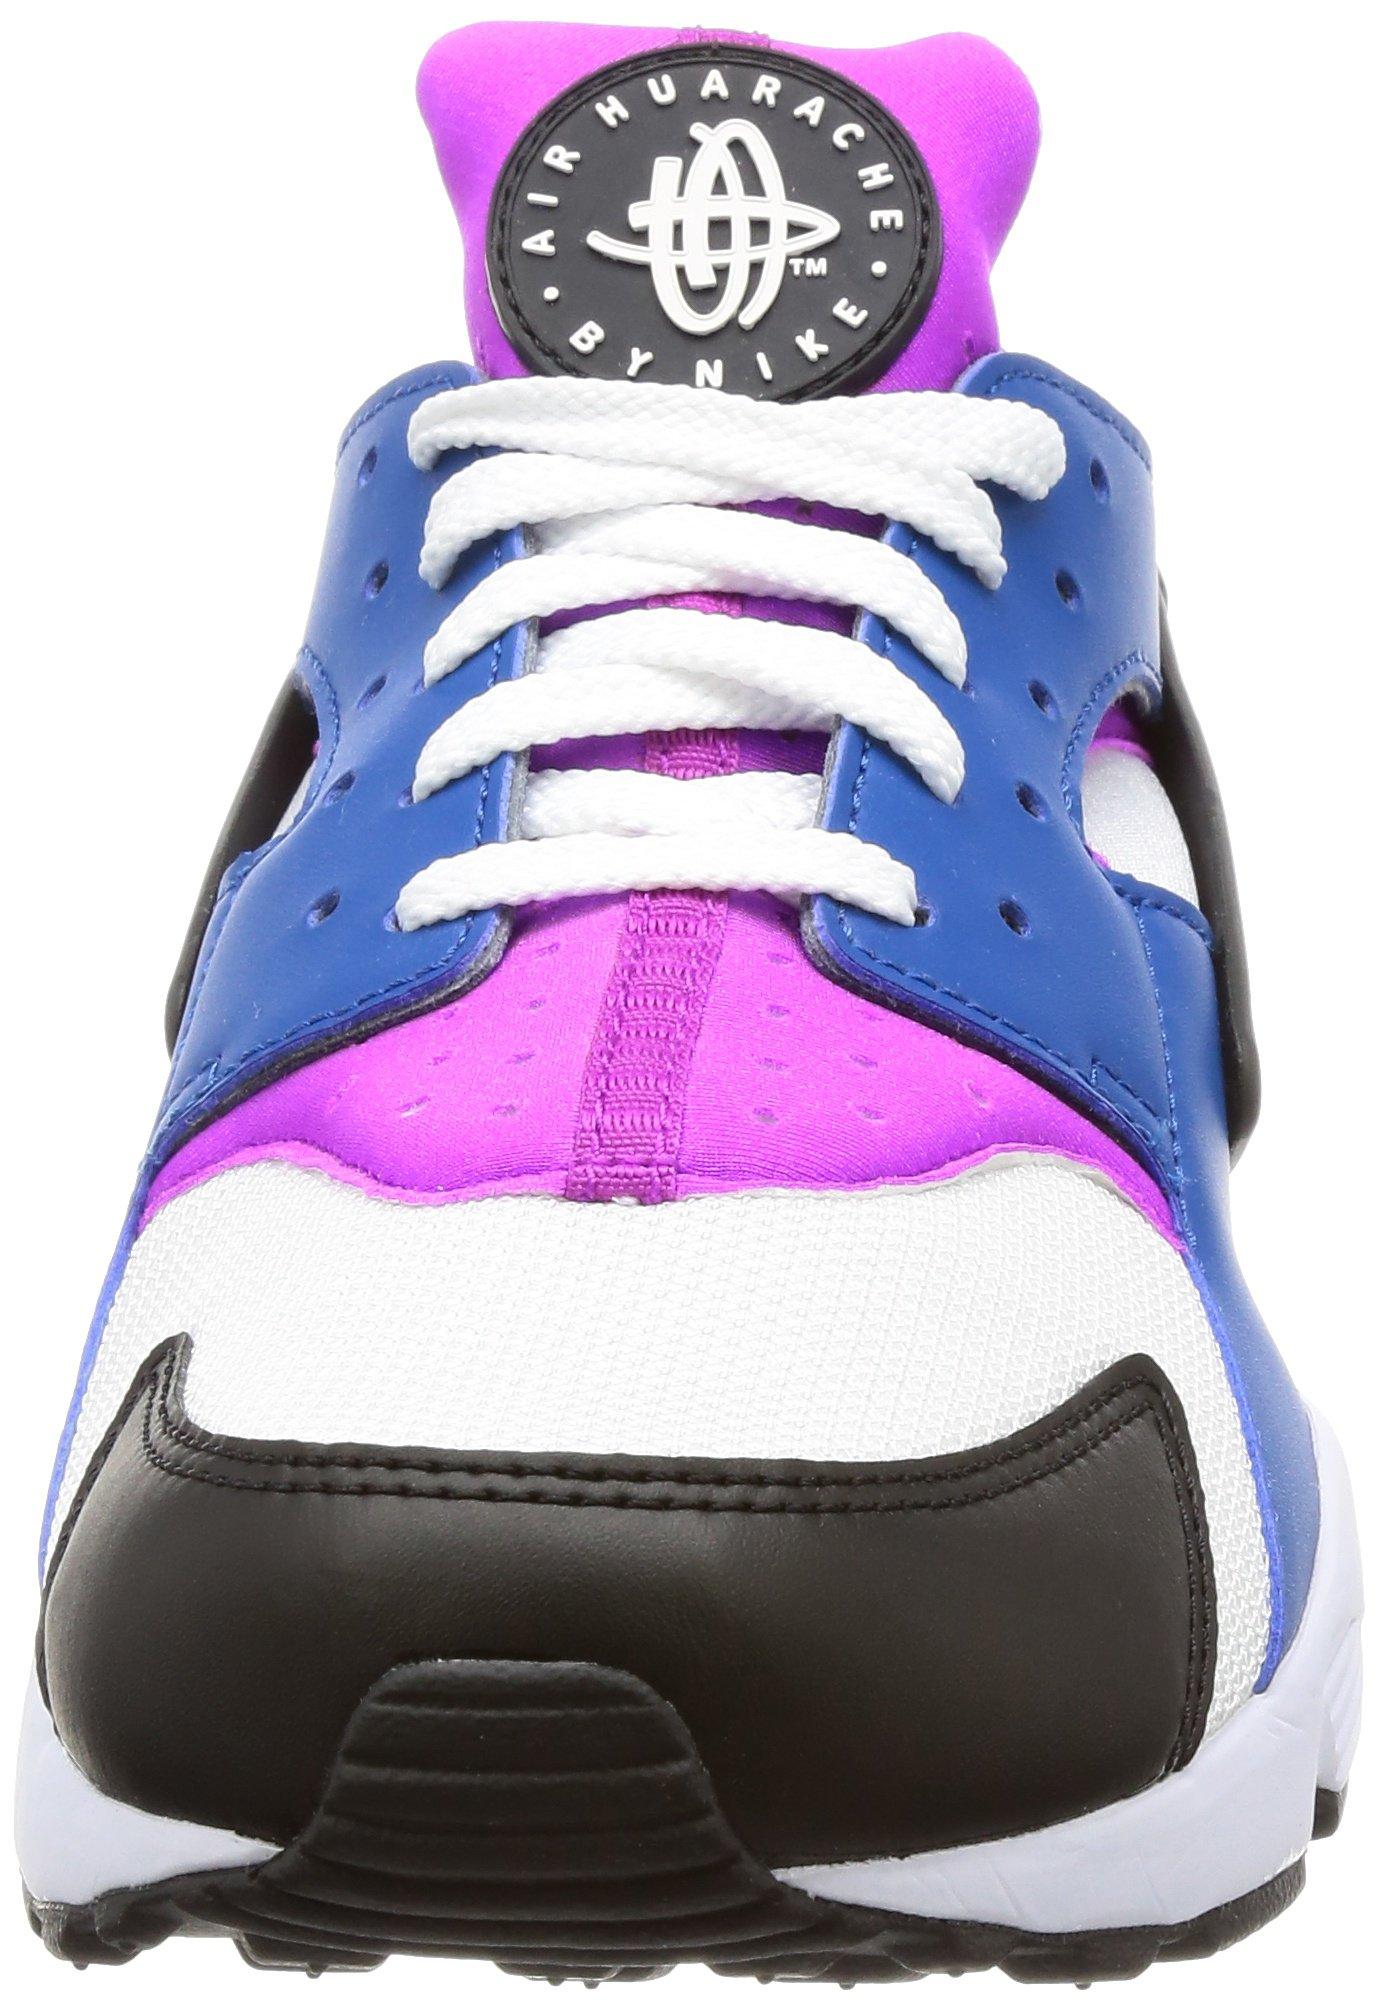 Nike Air Huarache Mens Style: 318429-415 Size: 7.5